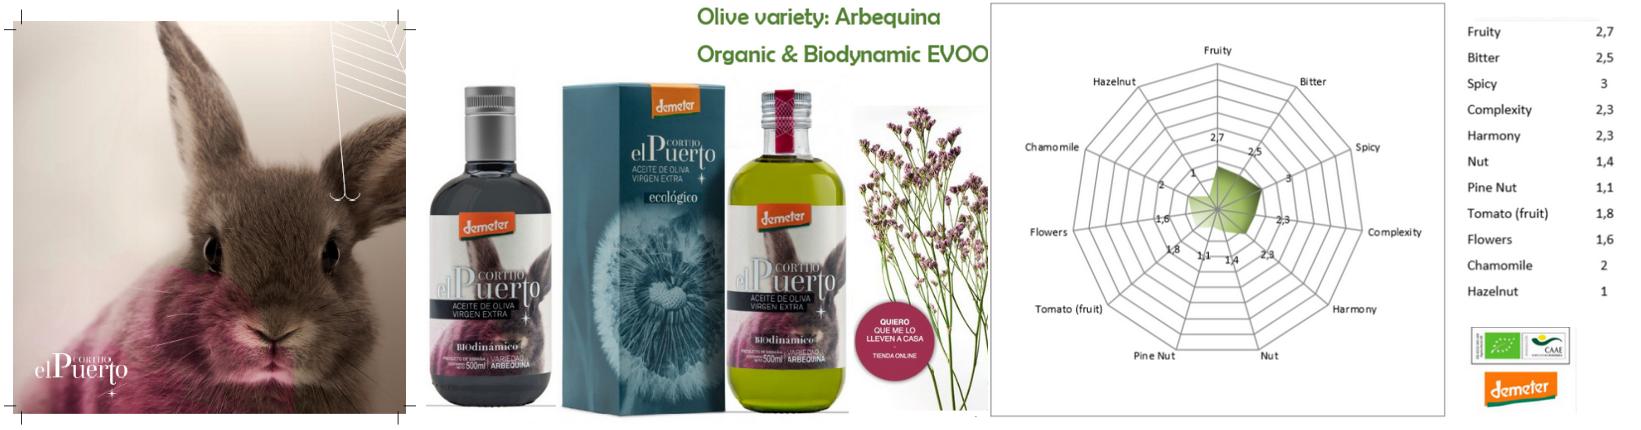 Arbequina Organic Biodynamic Extra virgin olive oil Cortijo el Puerto EVOO